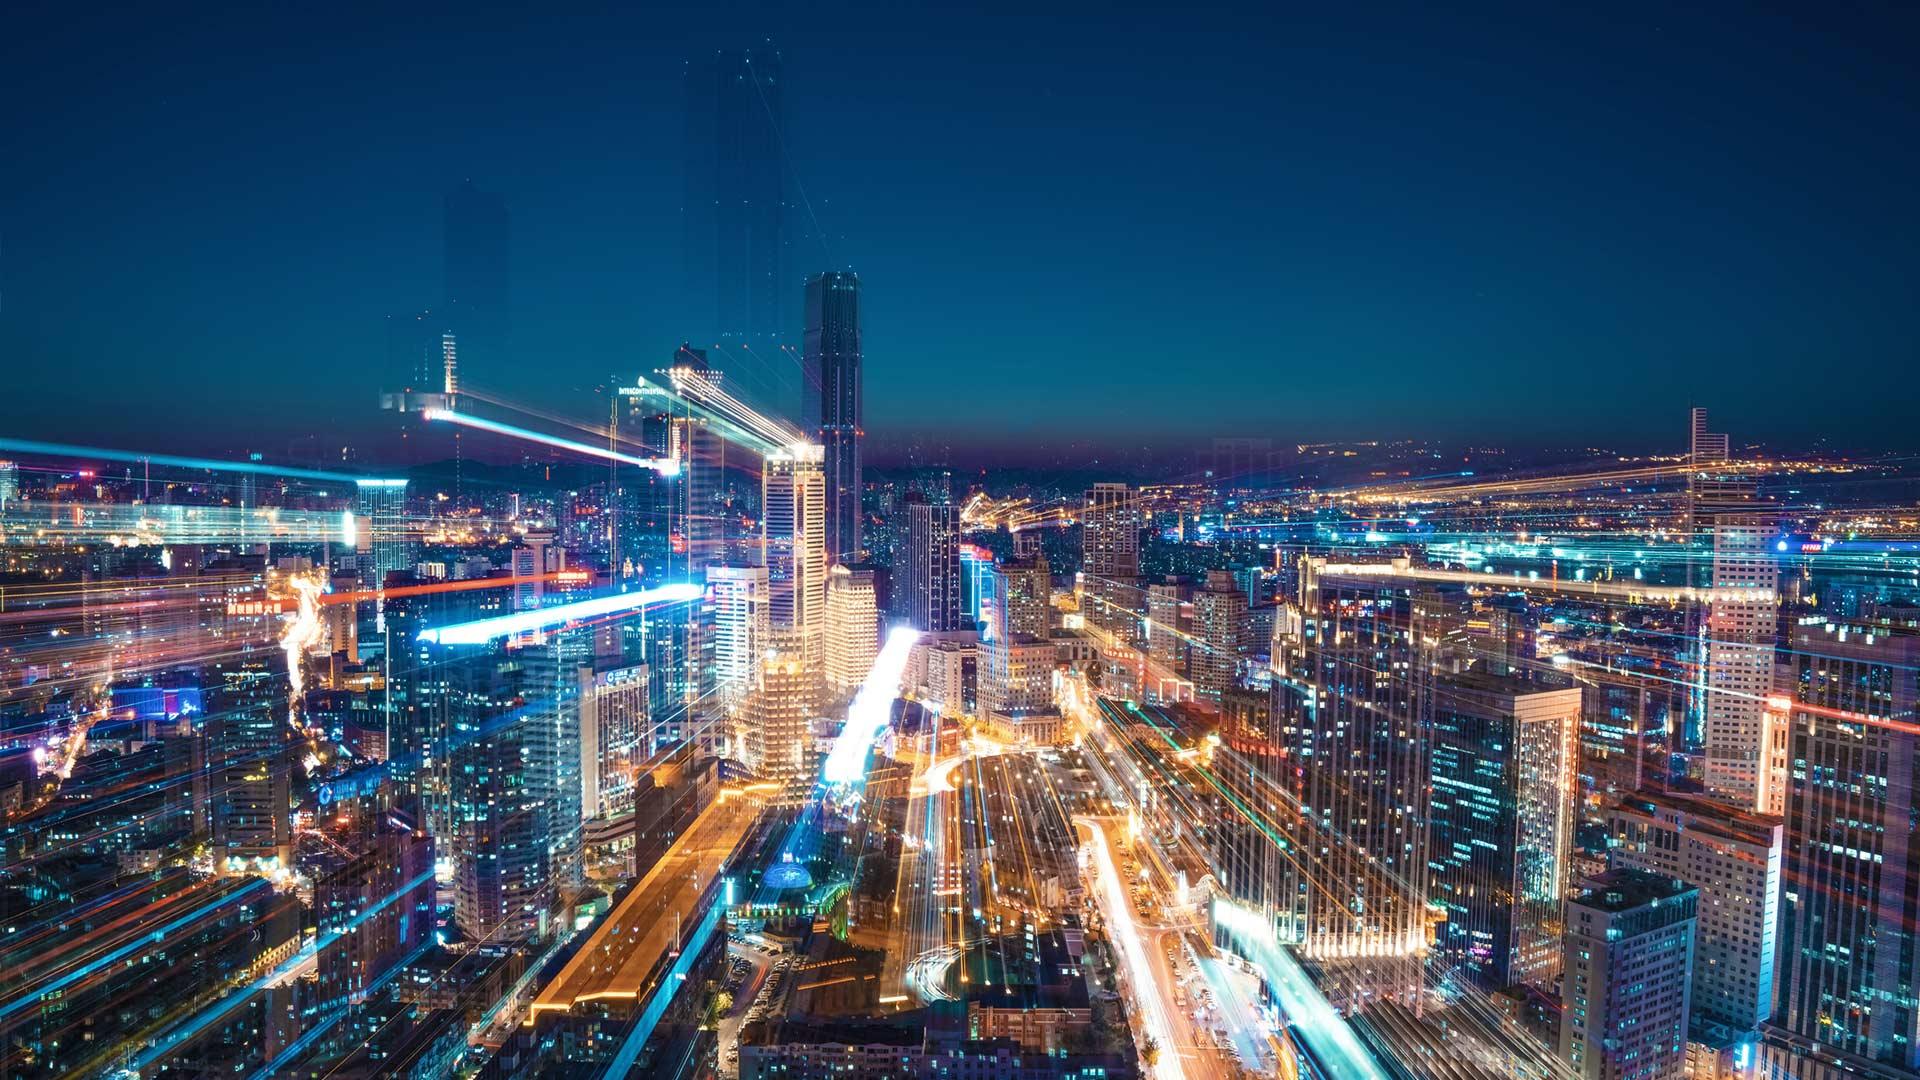 Long exposure city view